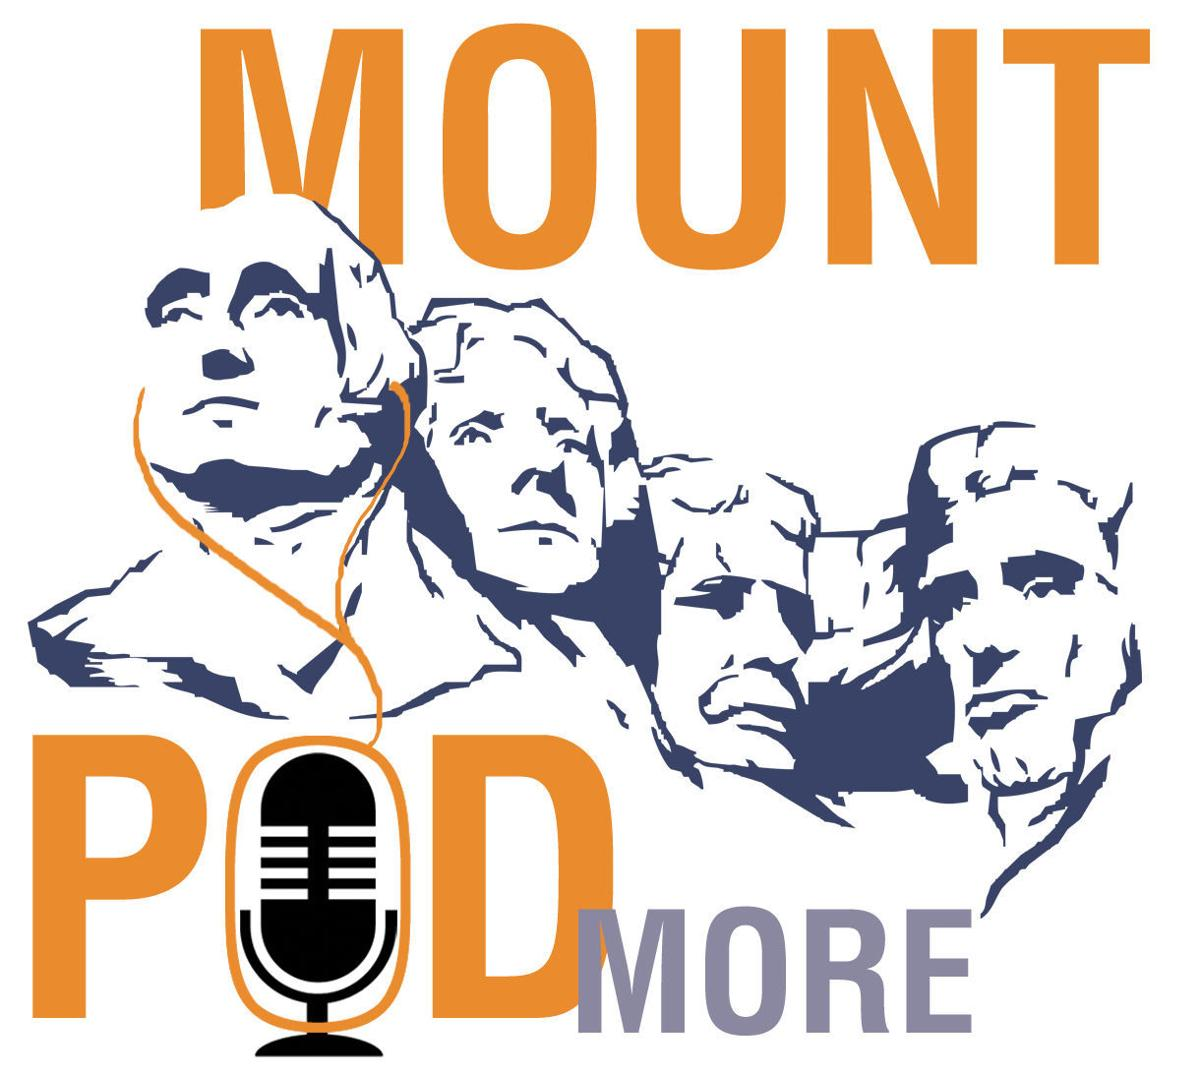 Mount Podmore logo